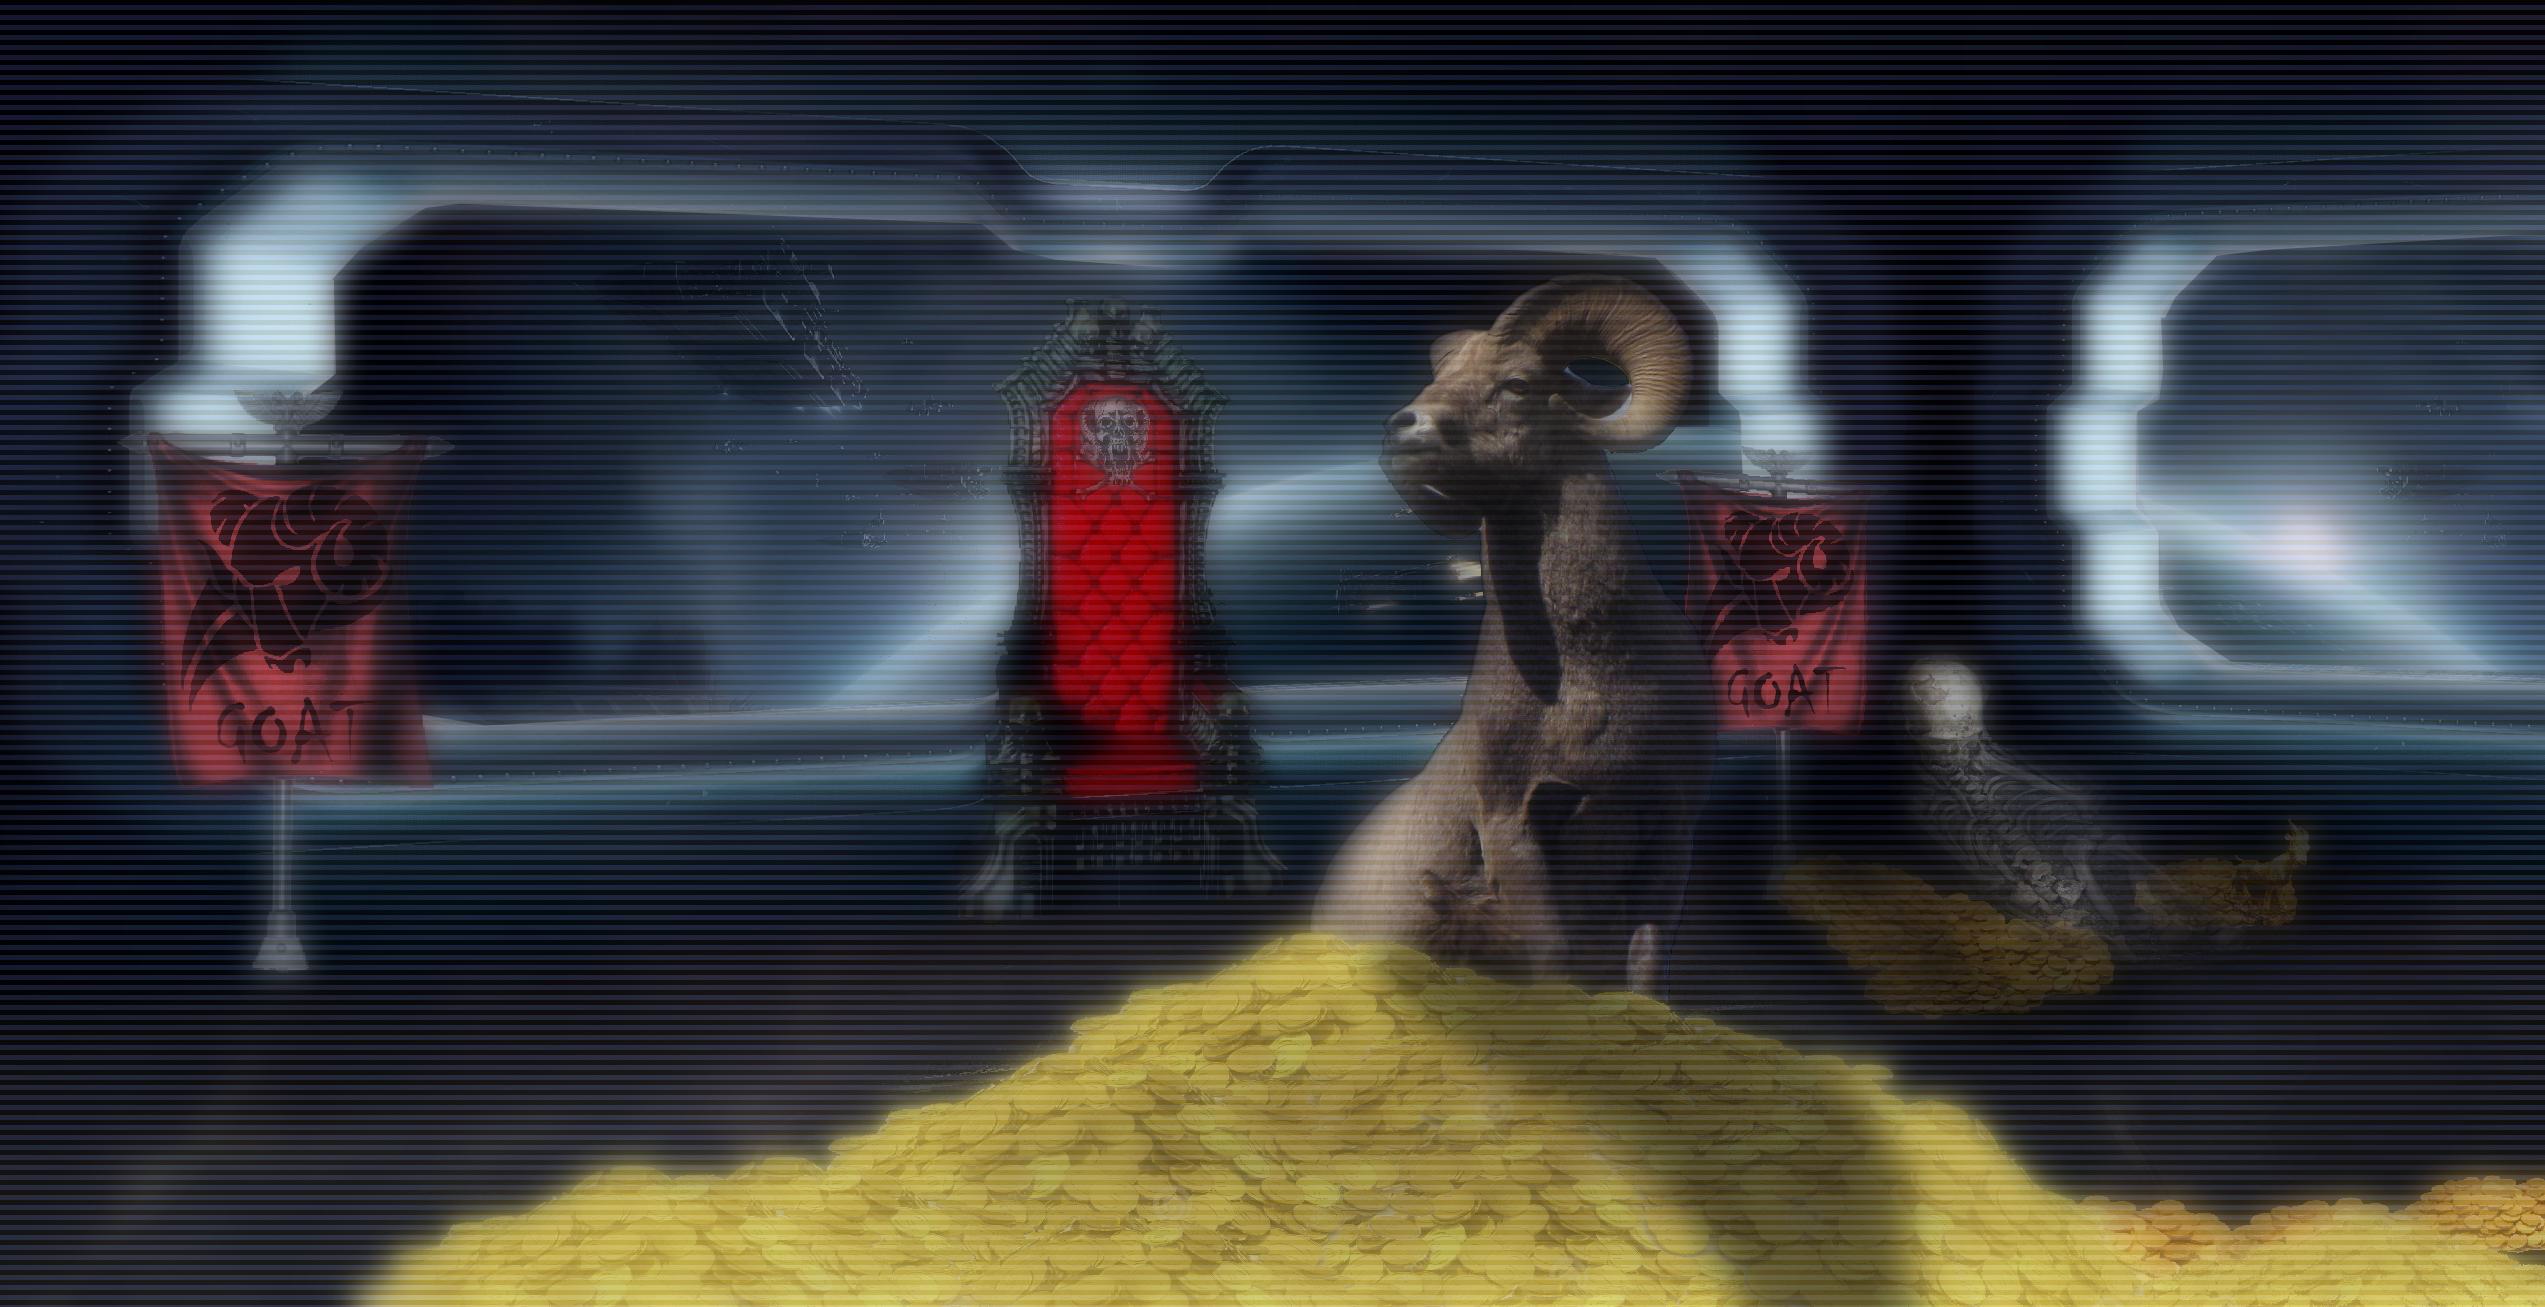 KIXEYE - Forum - Hologram: GOAT